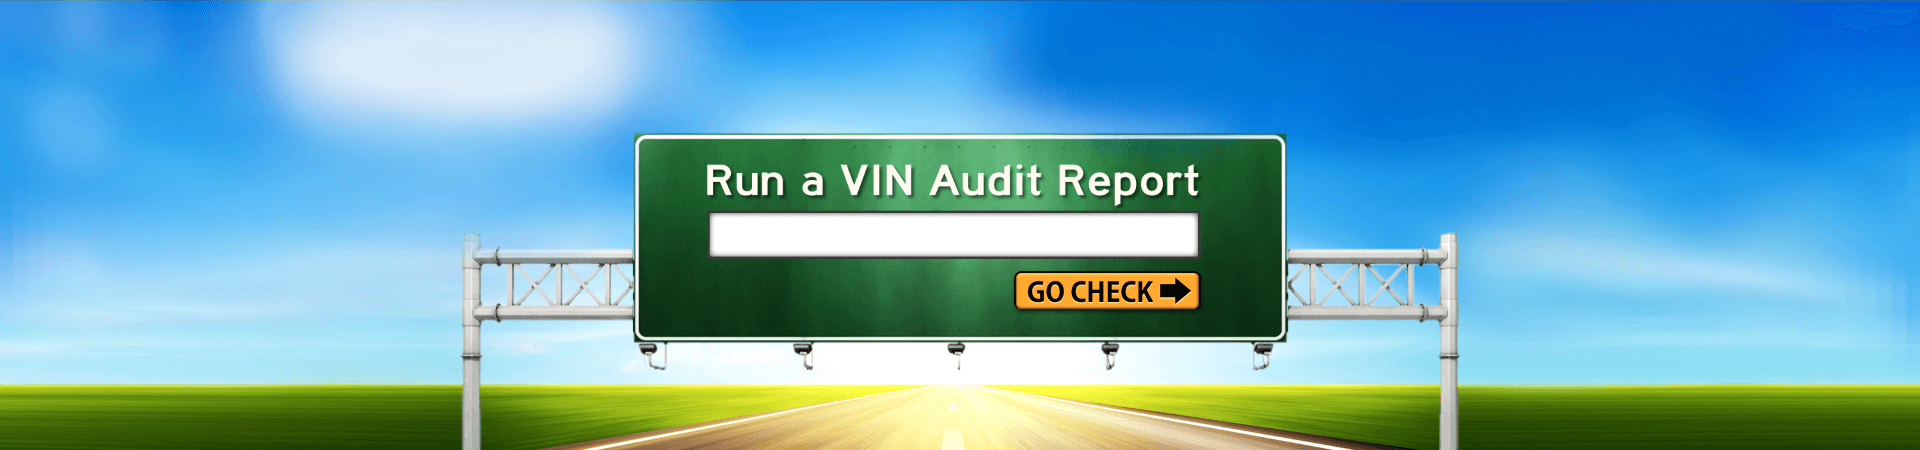 carfax report alternative free vin check nmvtis vehicle history the vehicle data resource. Black Bedroom Furniture Sets. Home Design Ideas